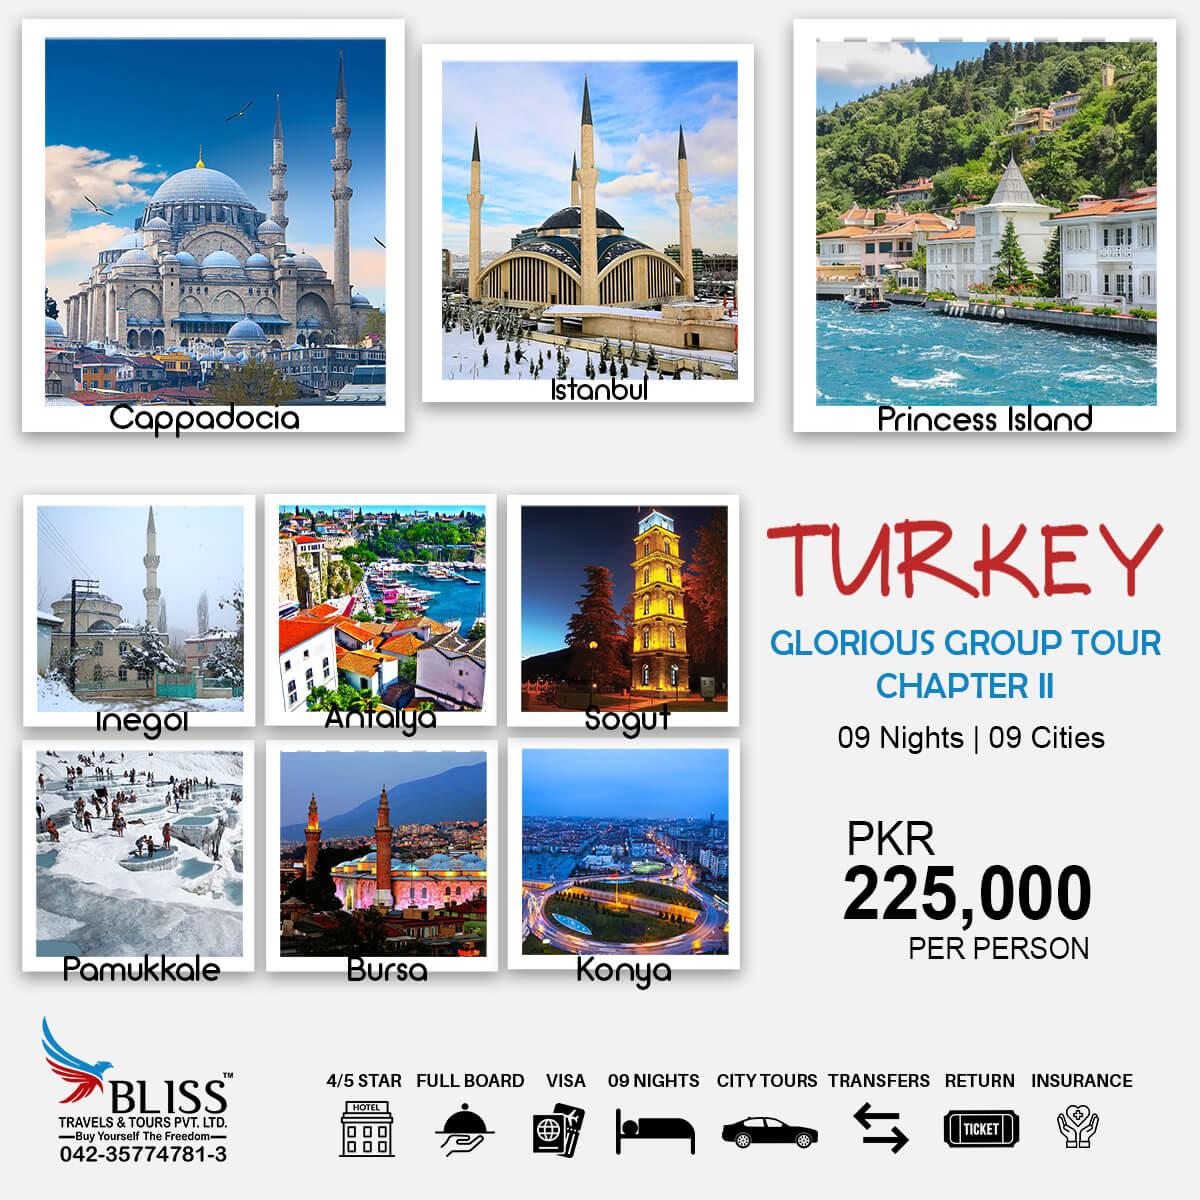 Turkey-Group-Tour-Chapter-II